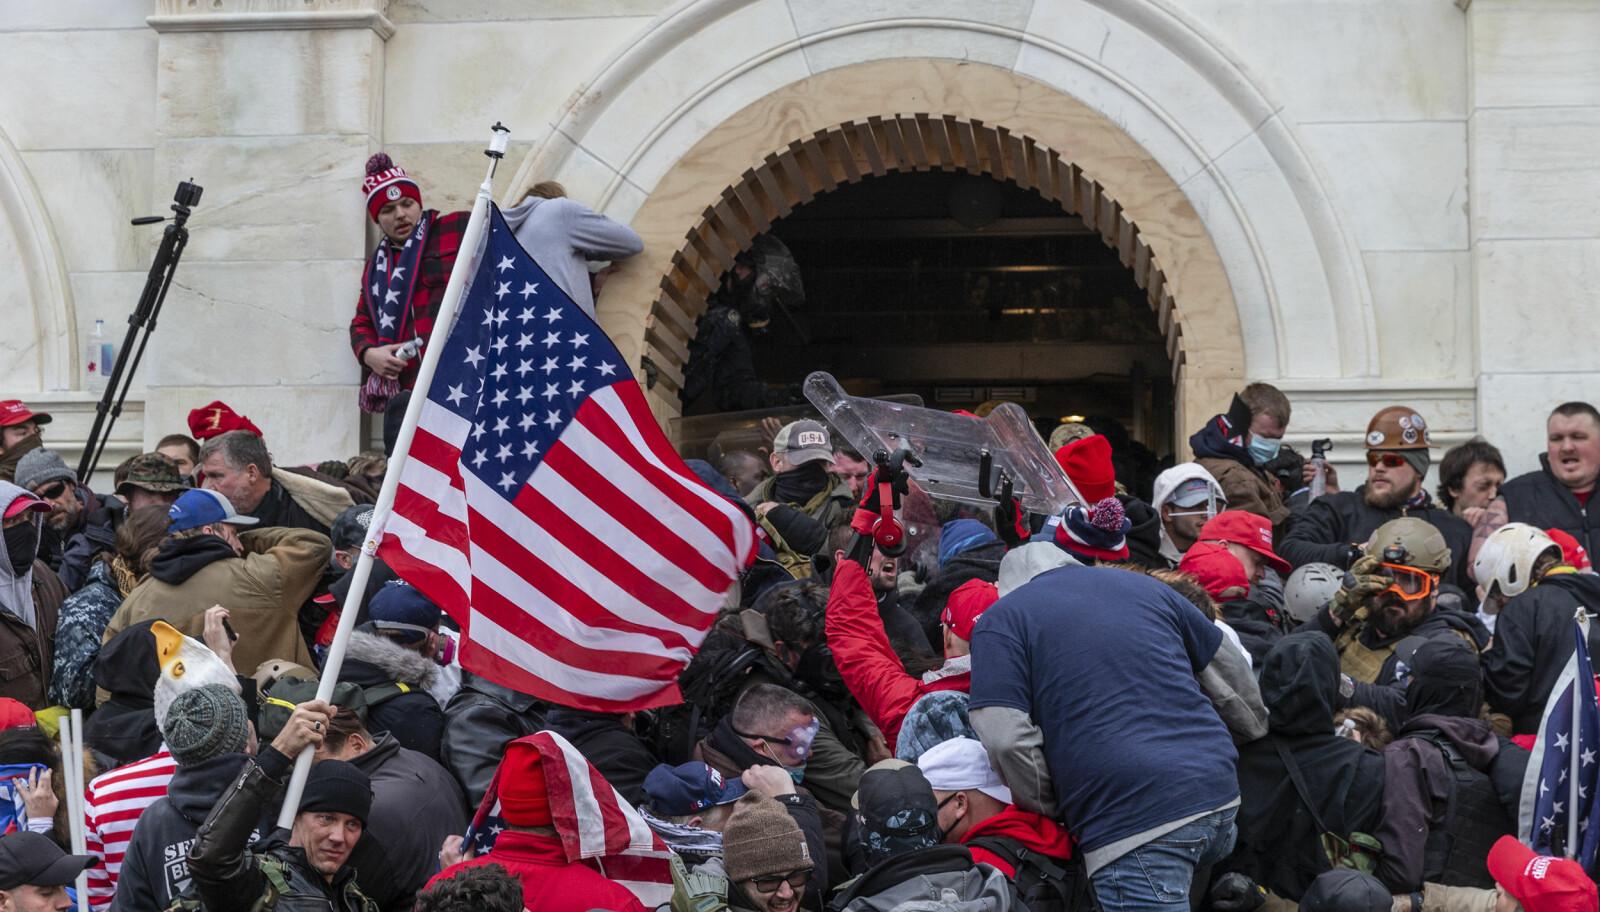 Uroligheter utenfor Kongressen i Washington D.C.